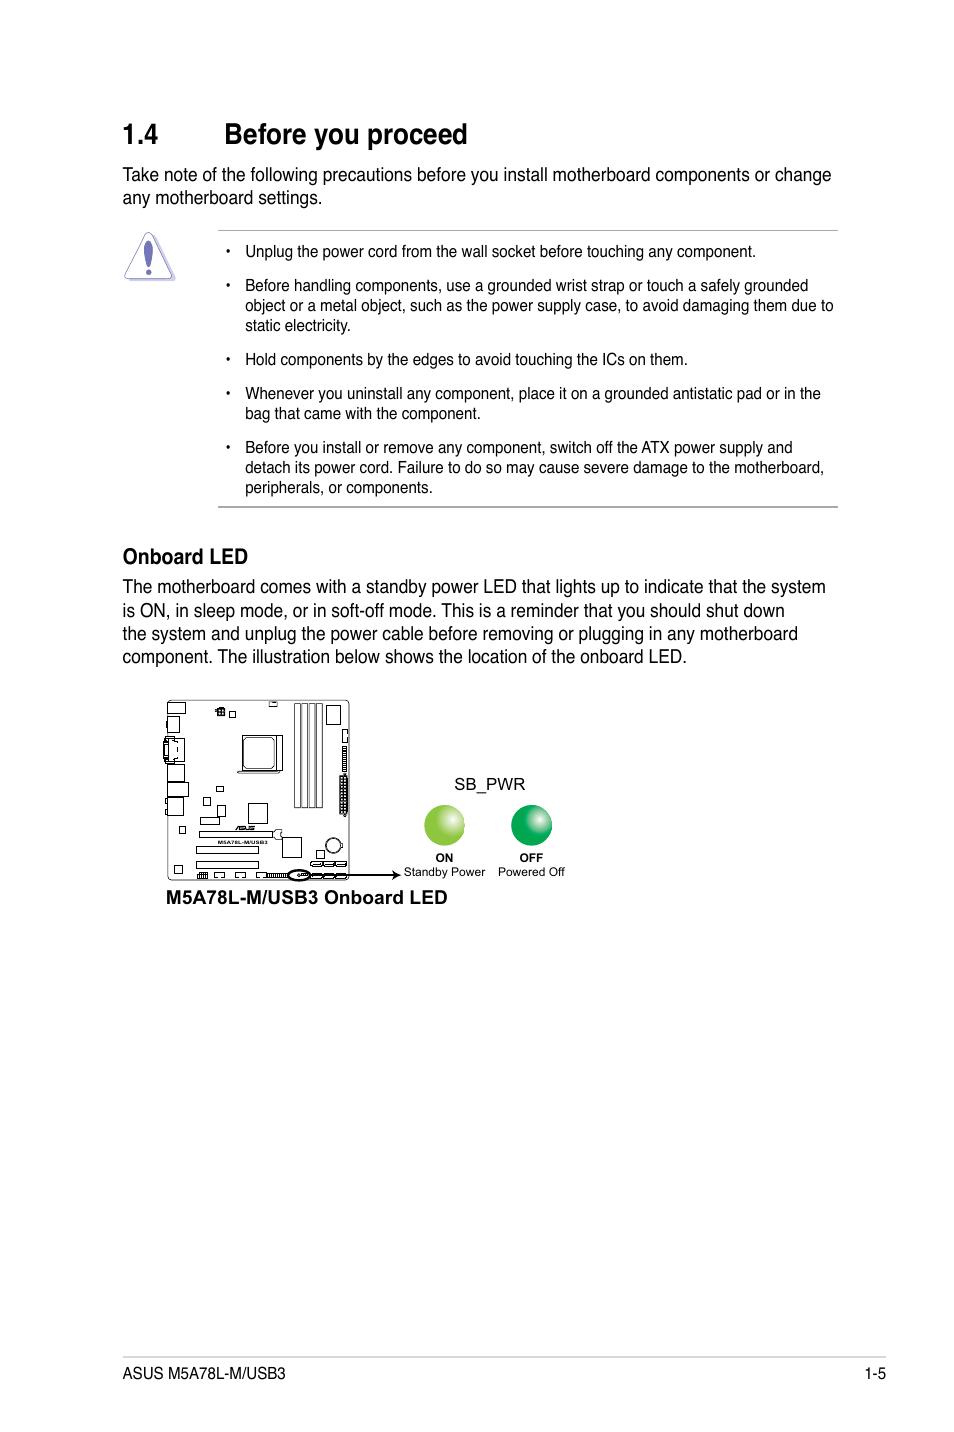 Asus m5a78l-m/usb3 motherboard download instruction manual pdf.